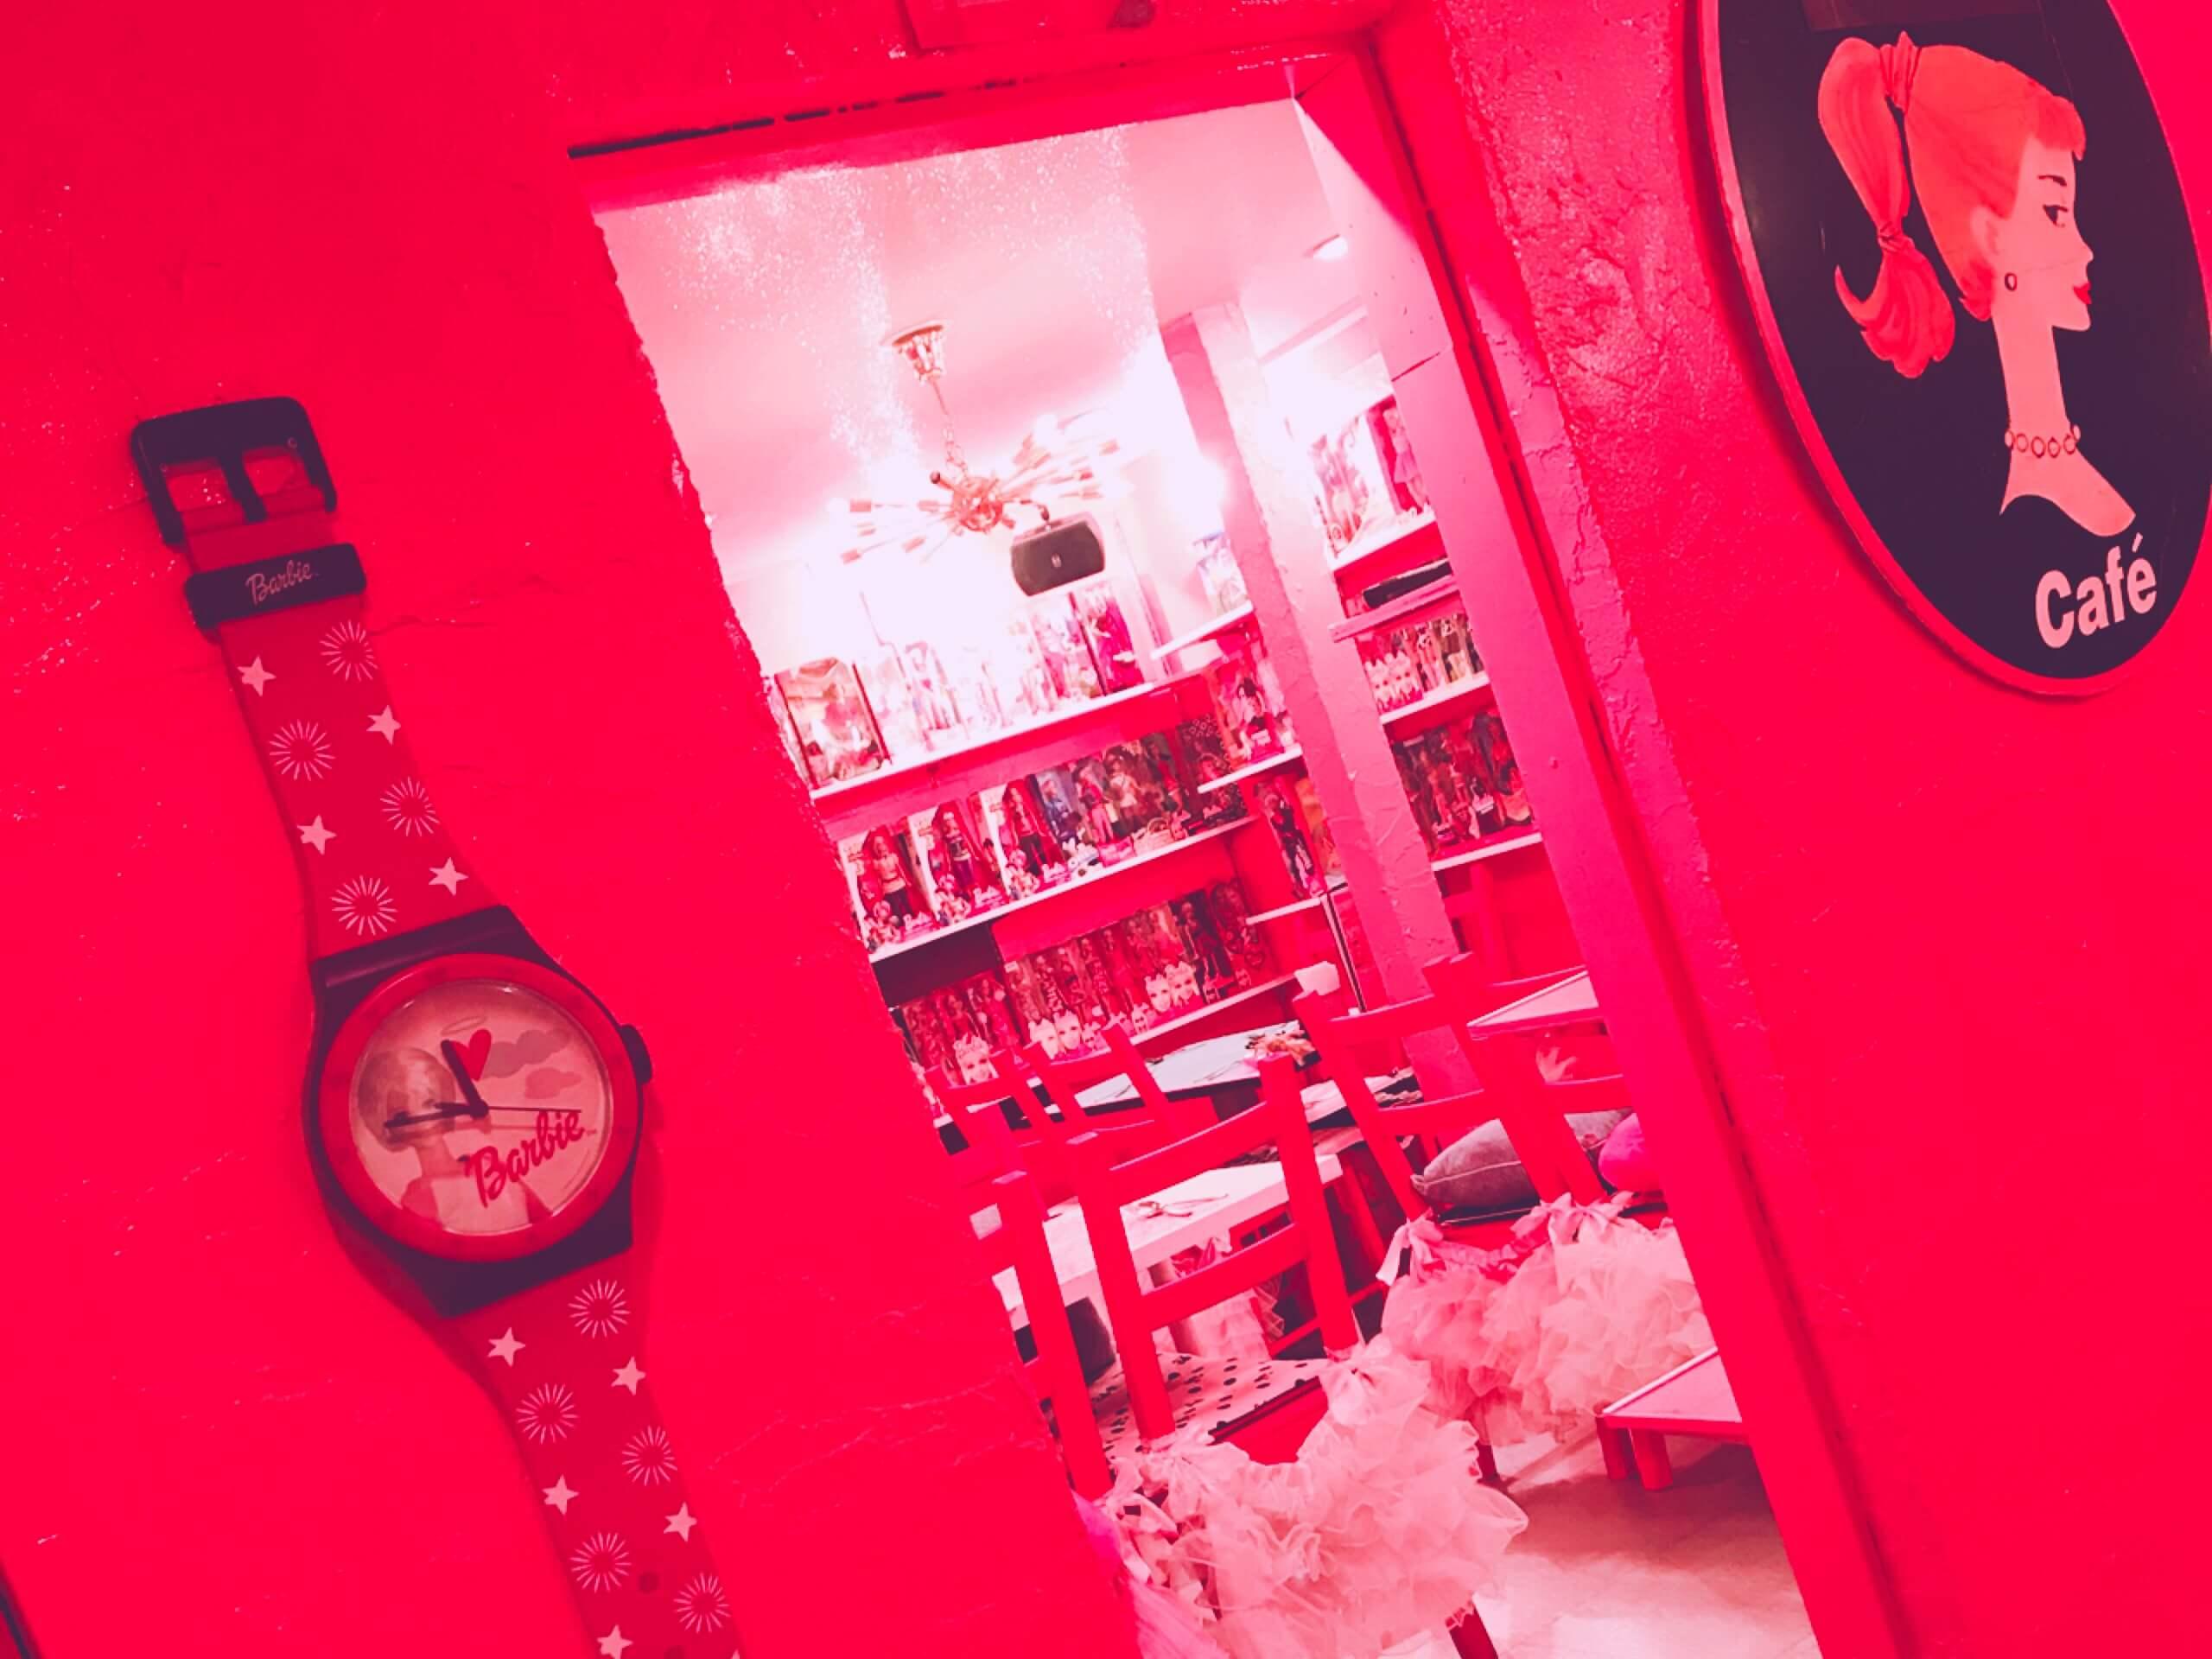 PinkHolidayCafe